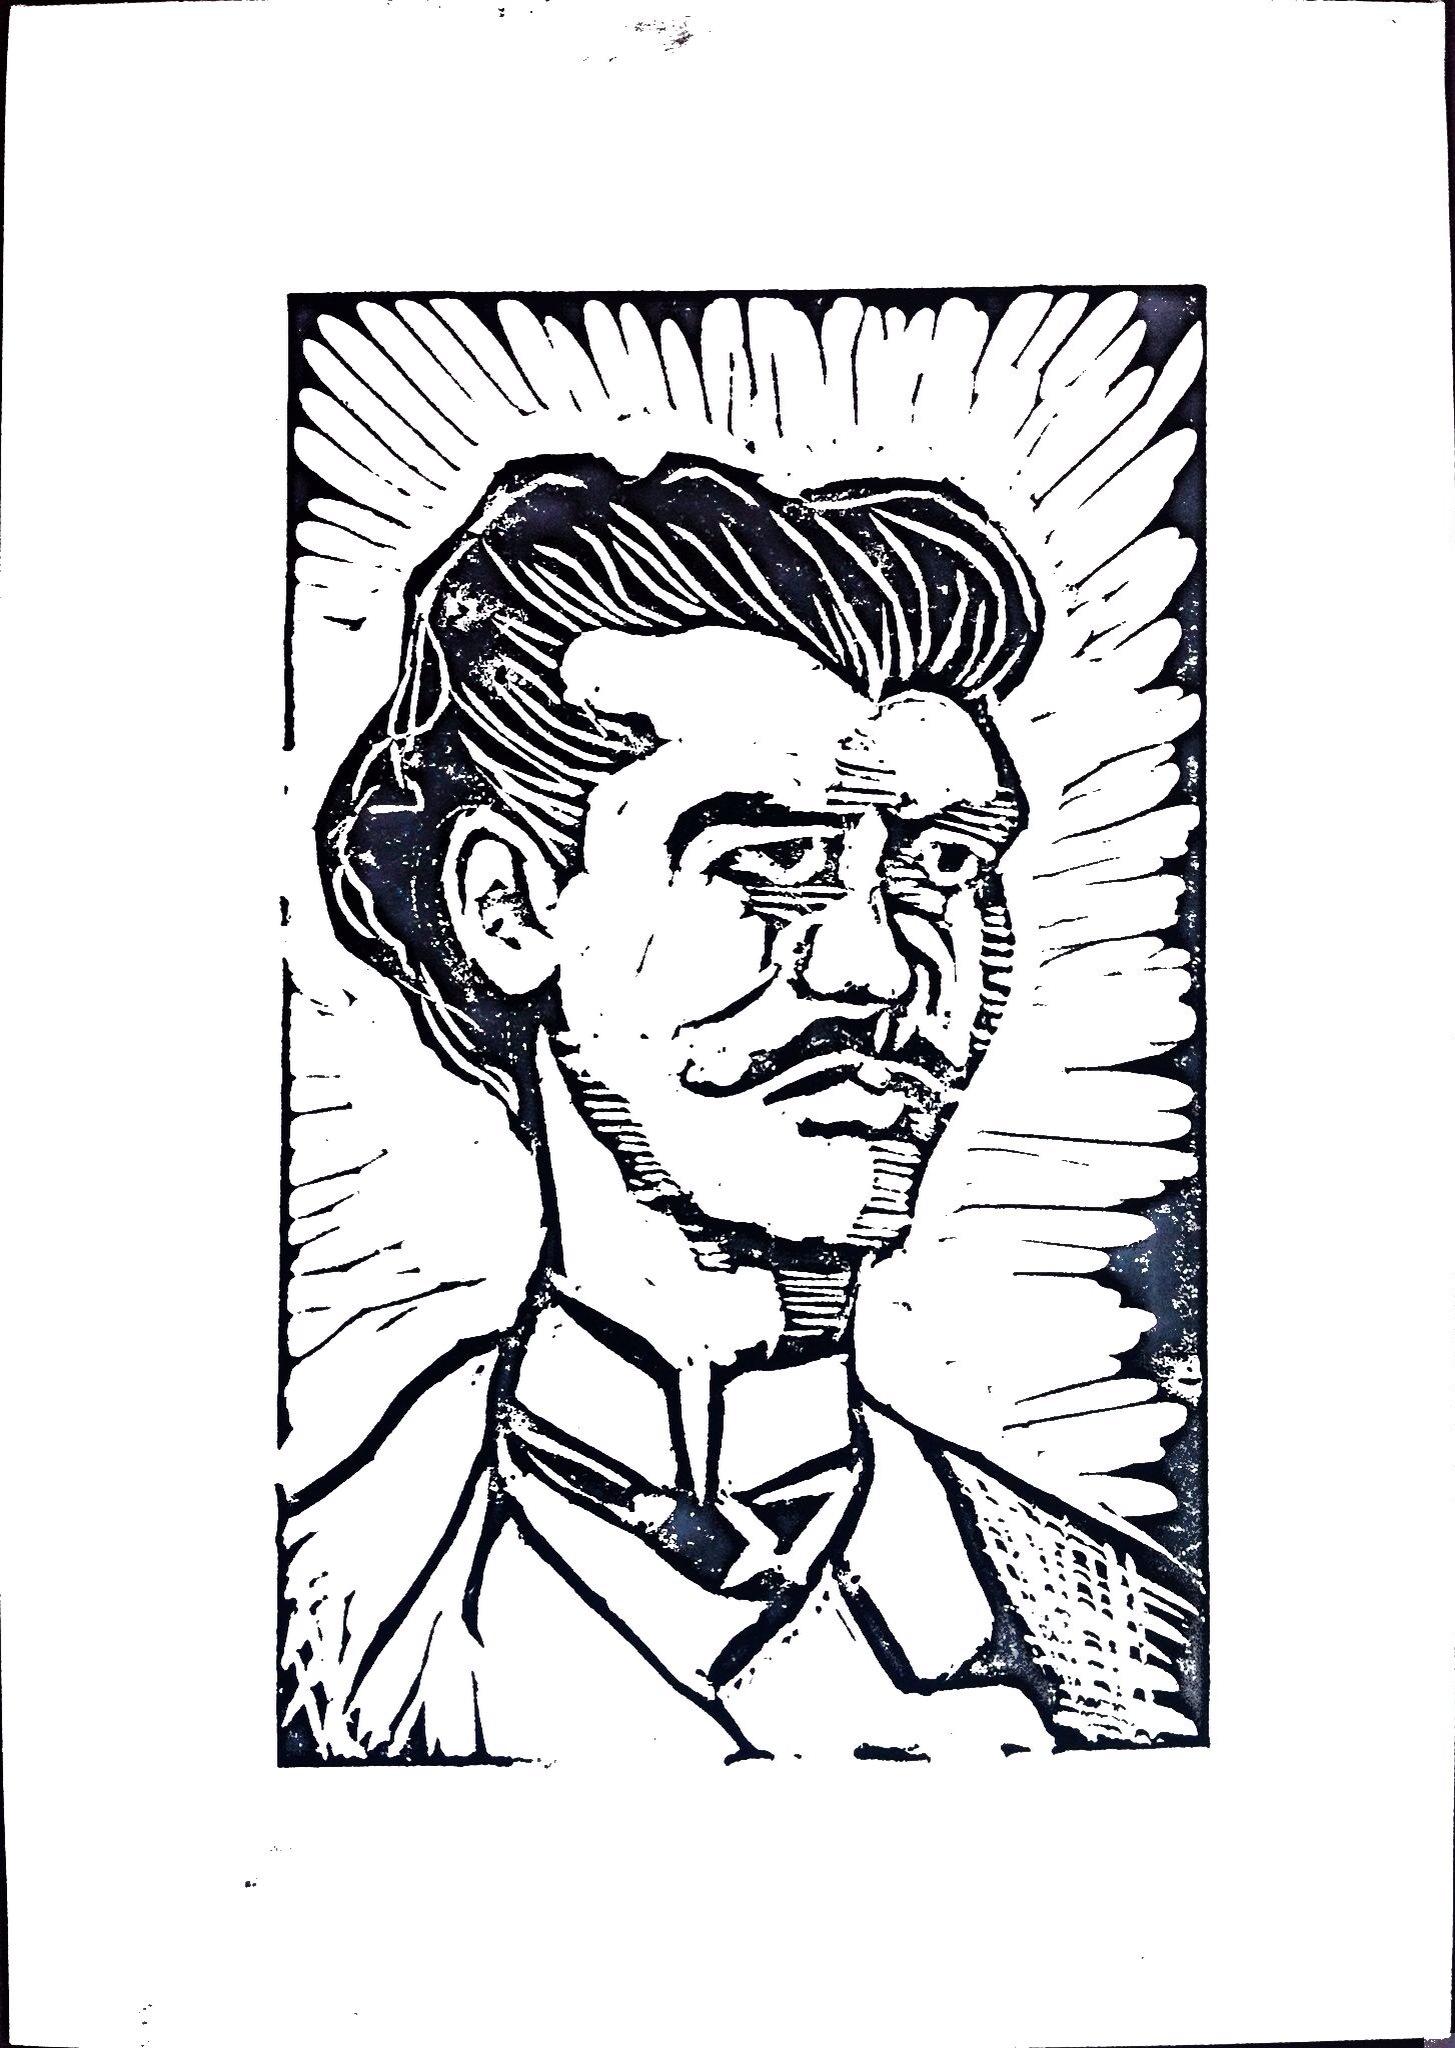 IMG 4635 - Era o Poeta Sanpaku?